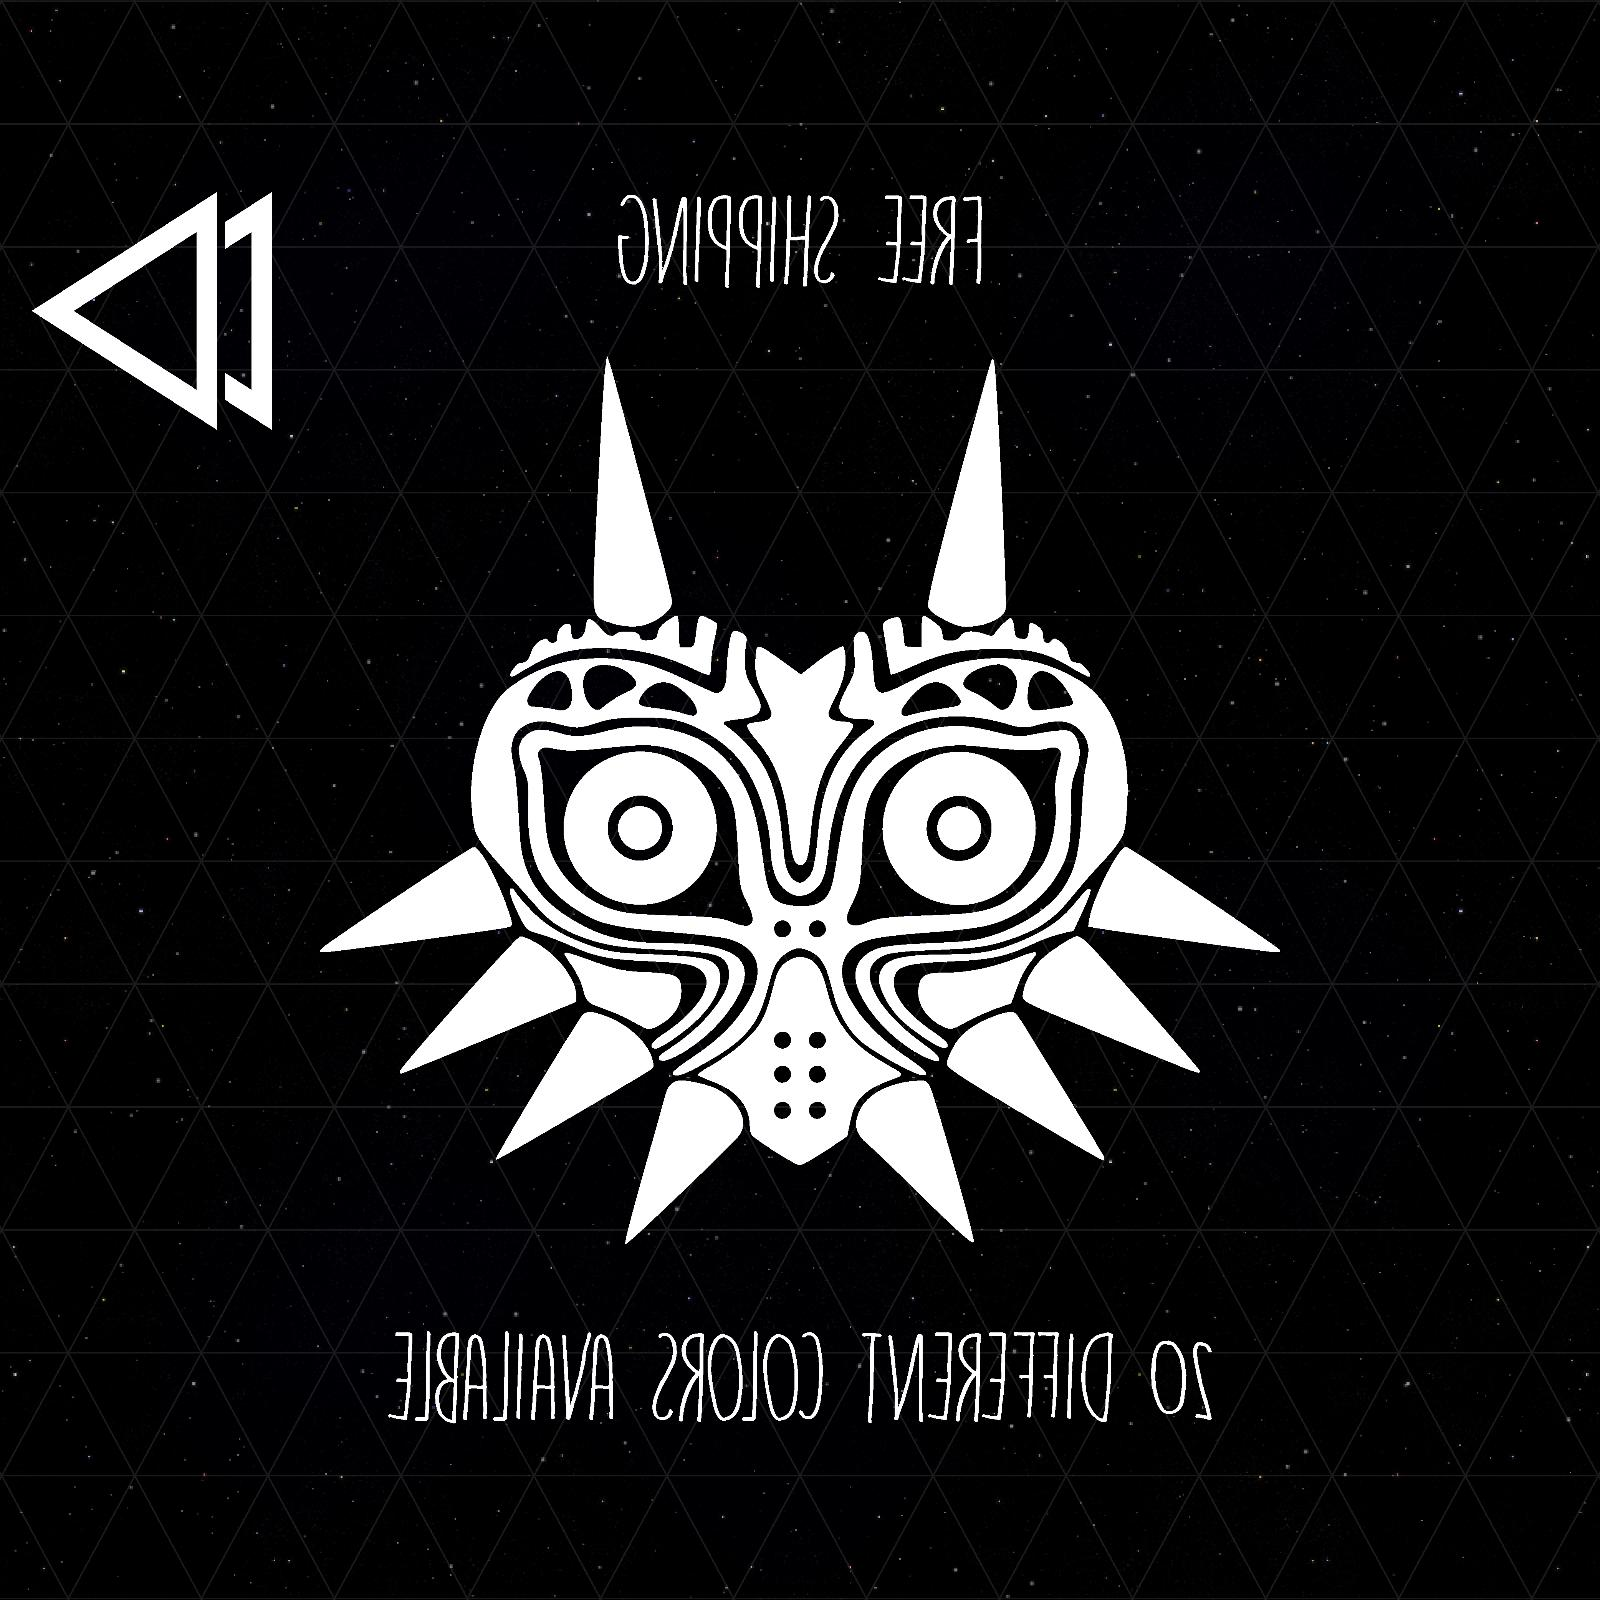 zelda majoras mask logo vinyl decal sticker